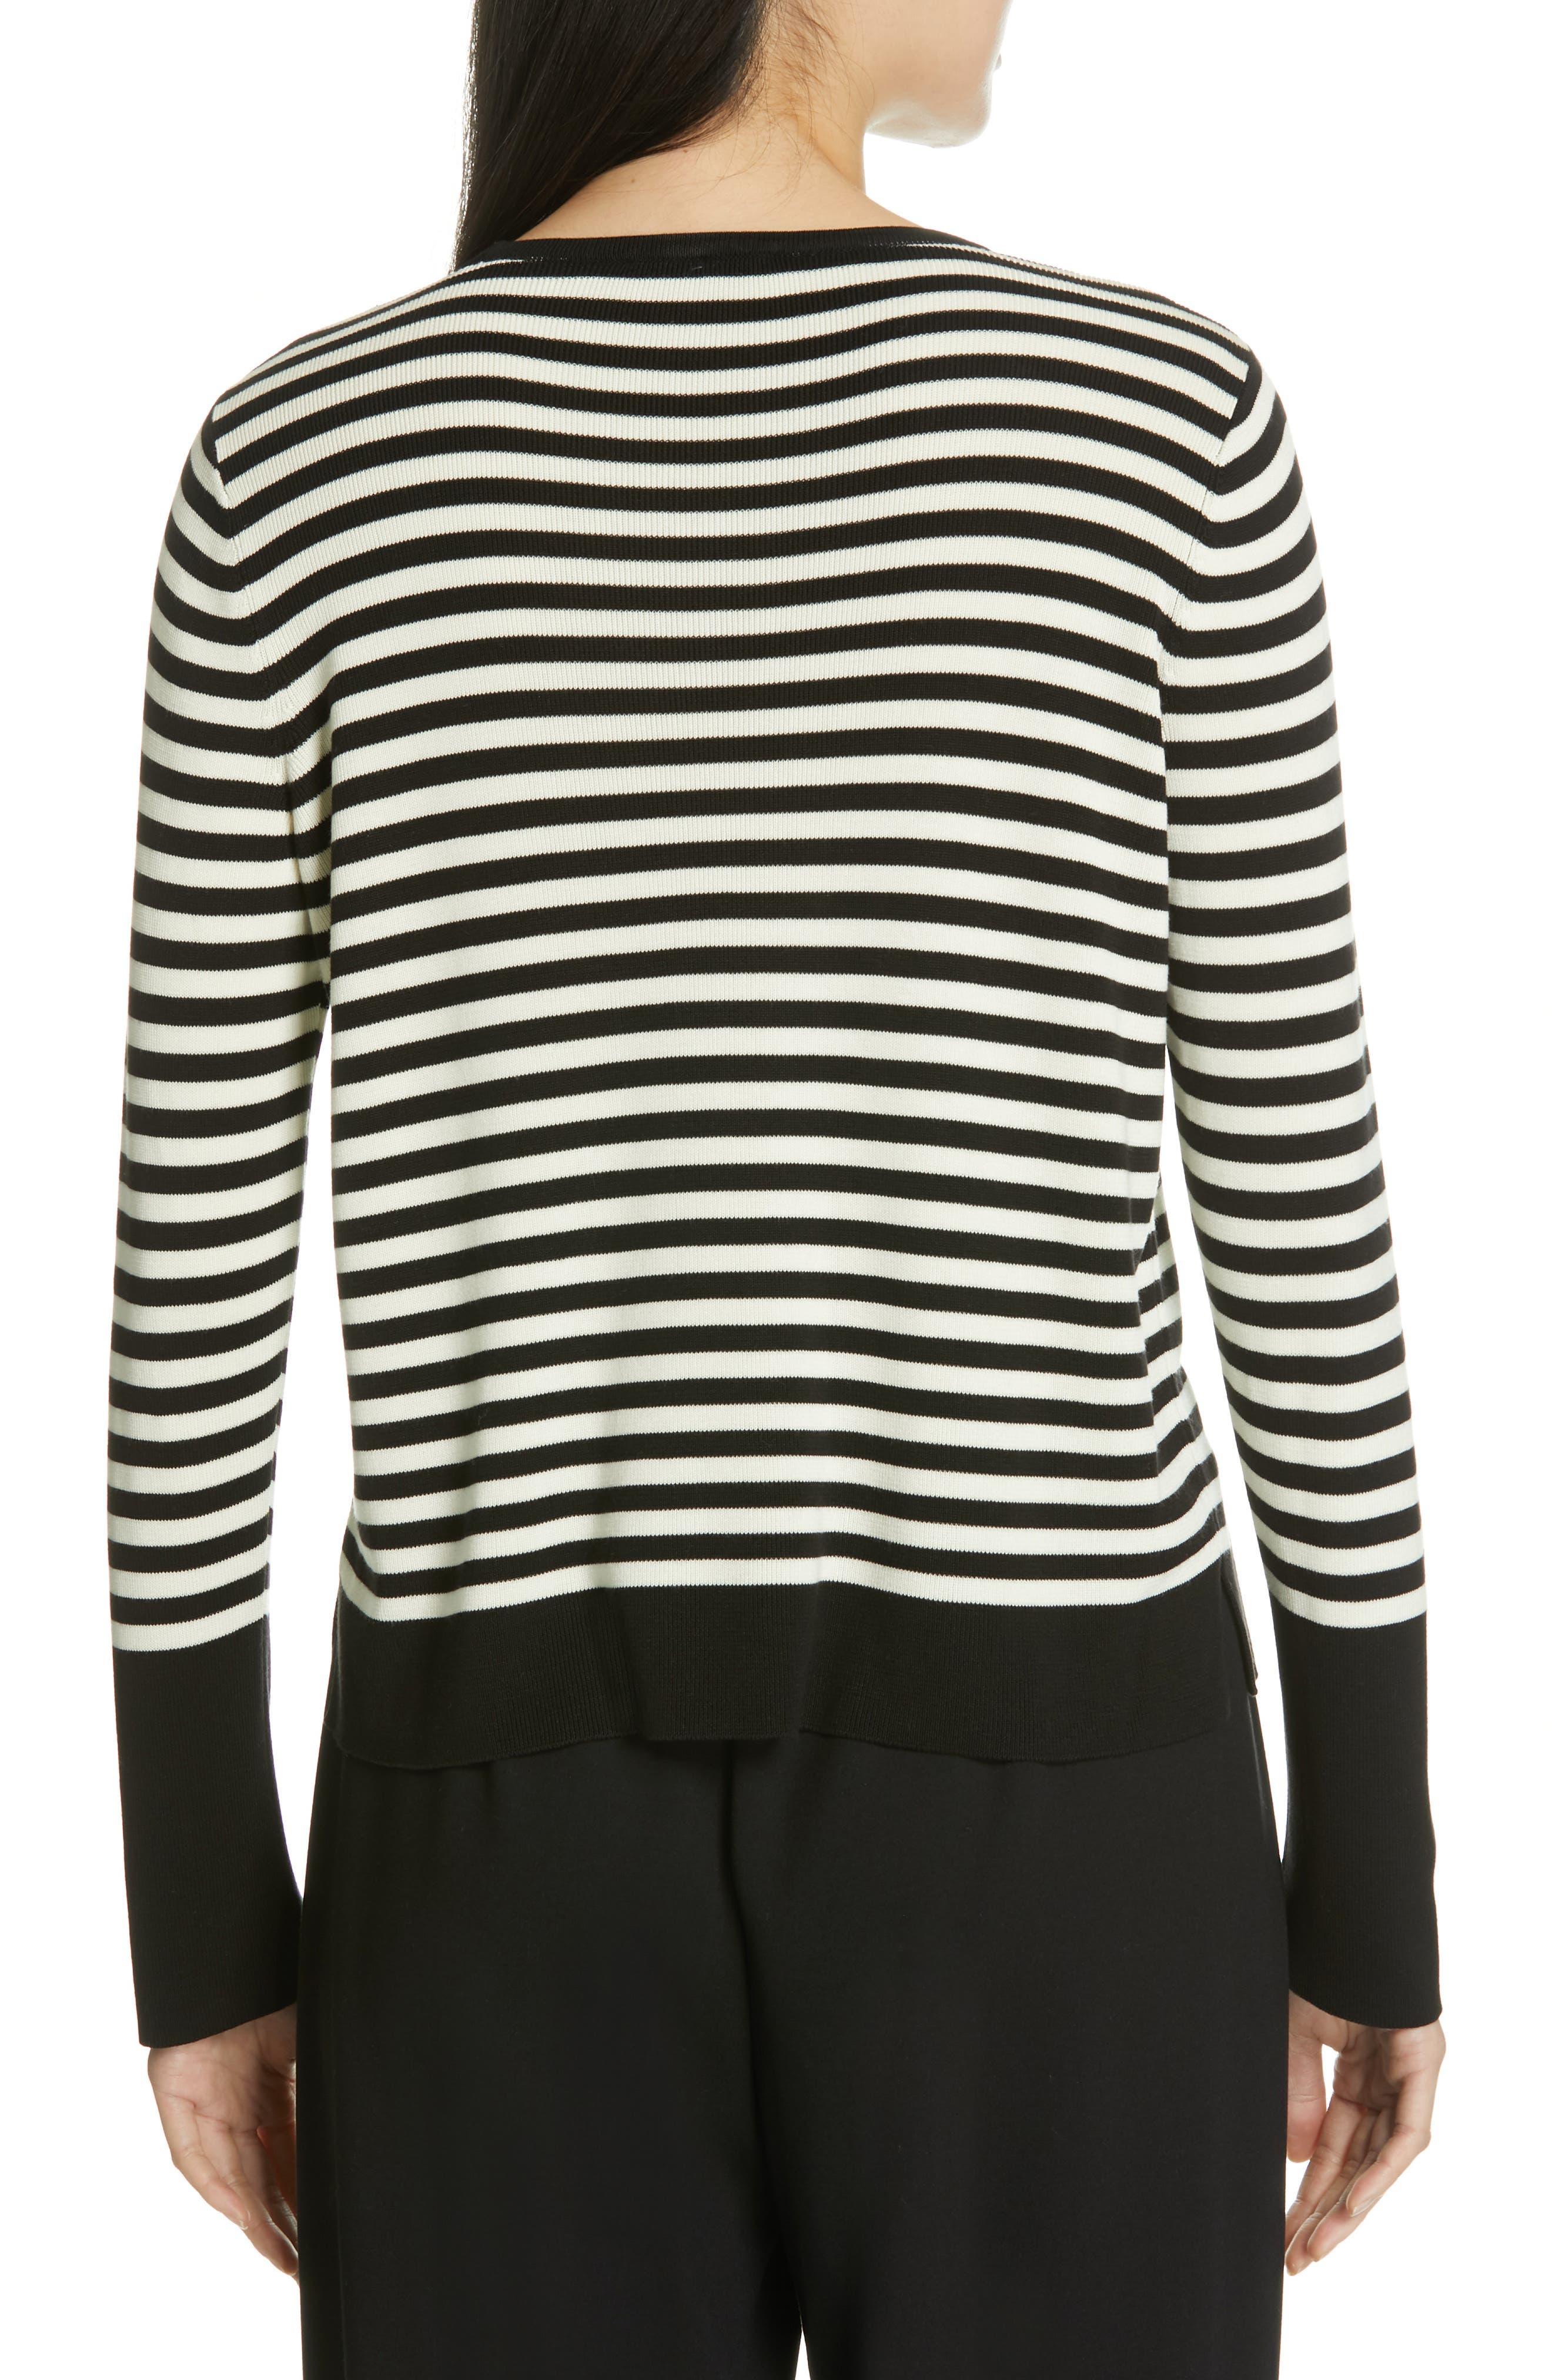 Tencel<sup>®</sup> Lyocell & Silk Sweater,                             Alternate thumbnail 2, color,                             BLACK/ SOFT WHITE